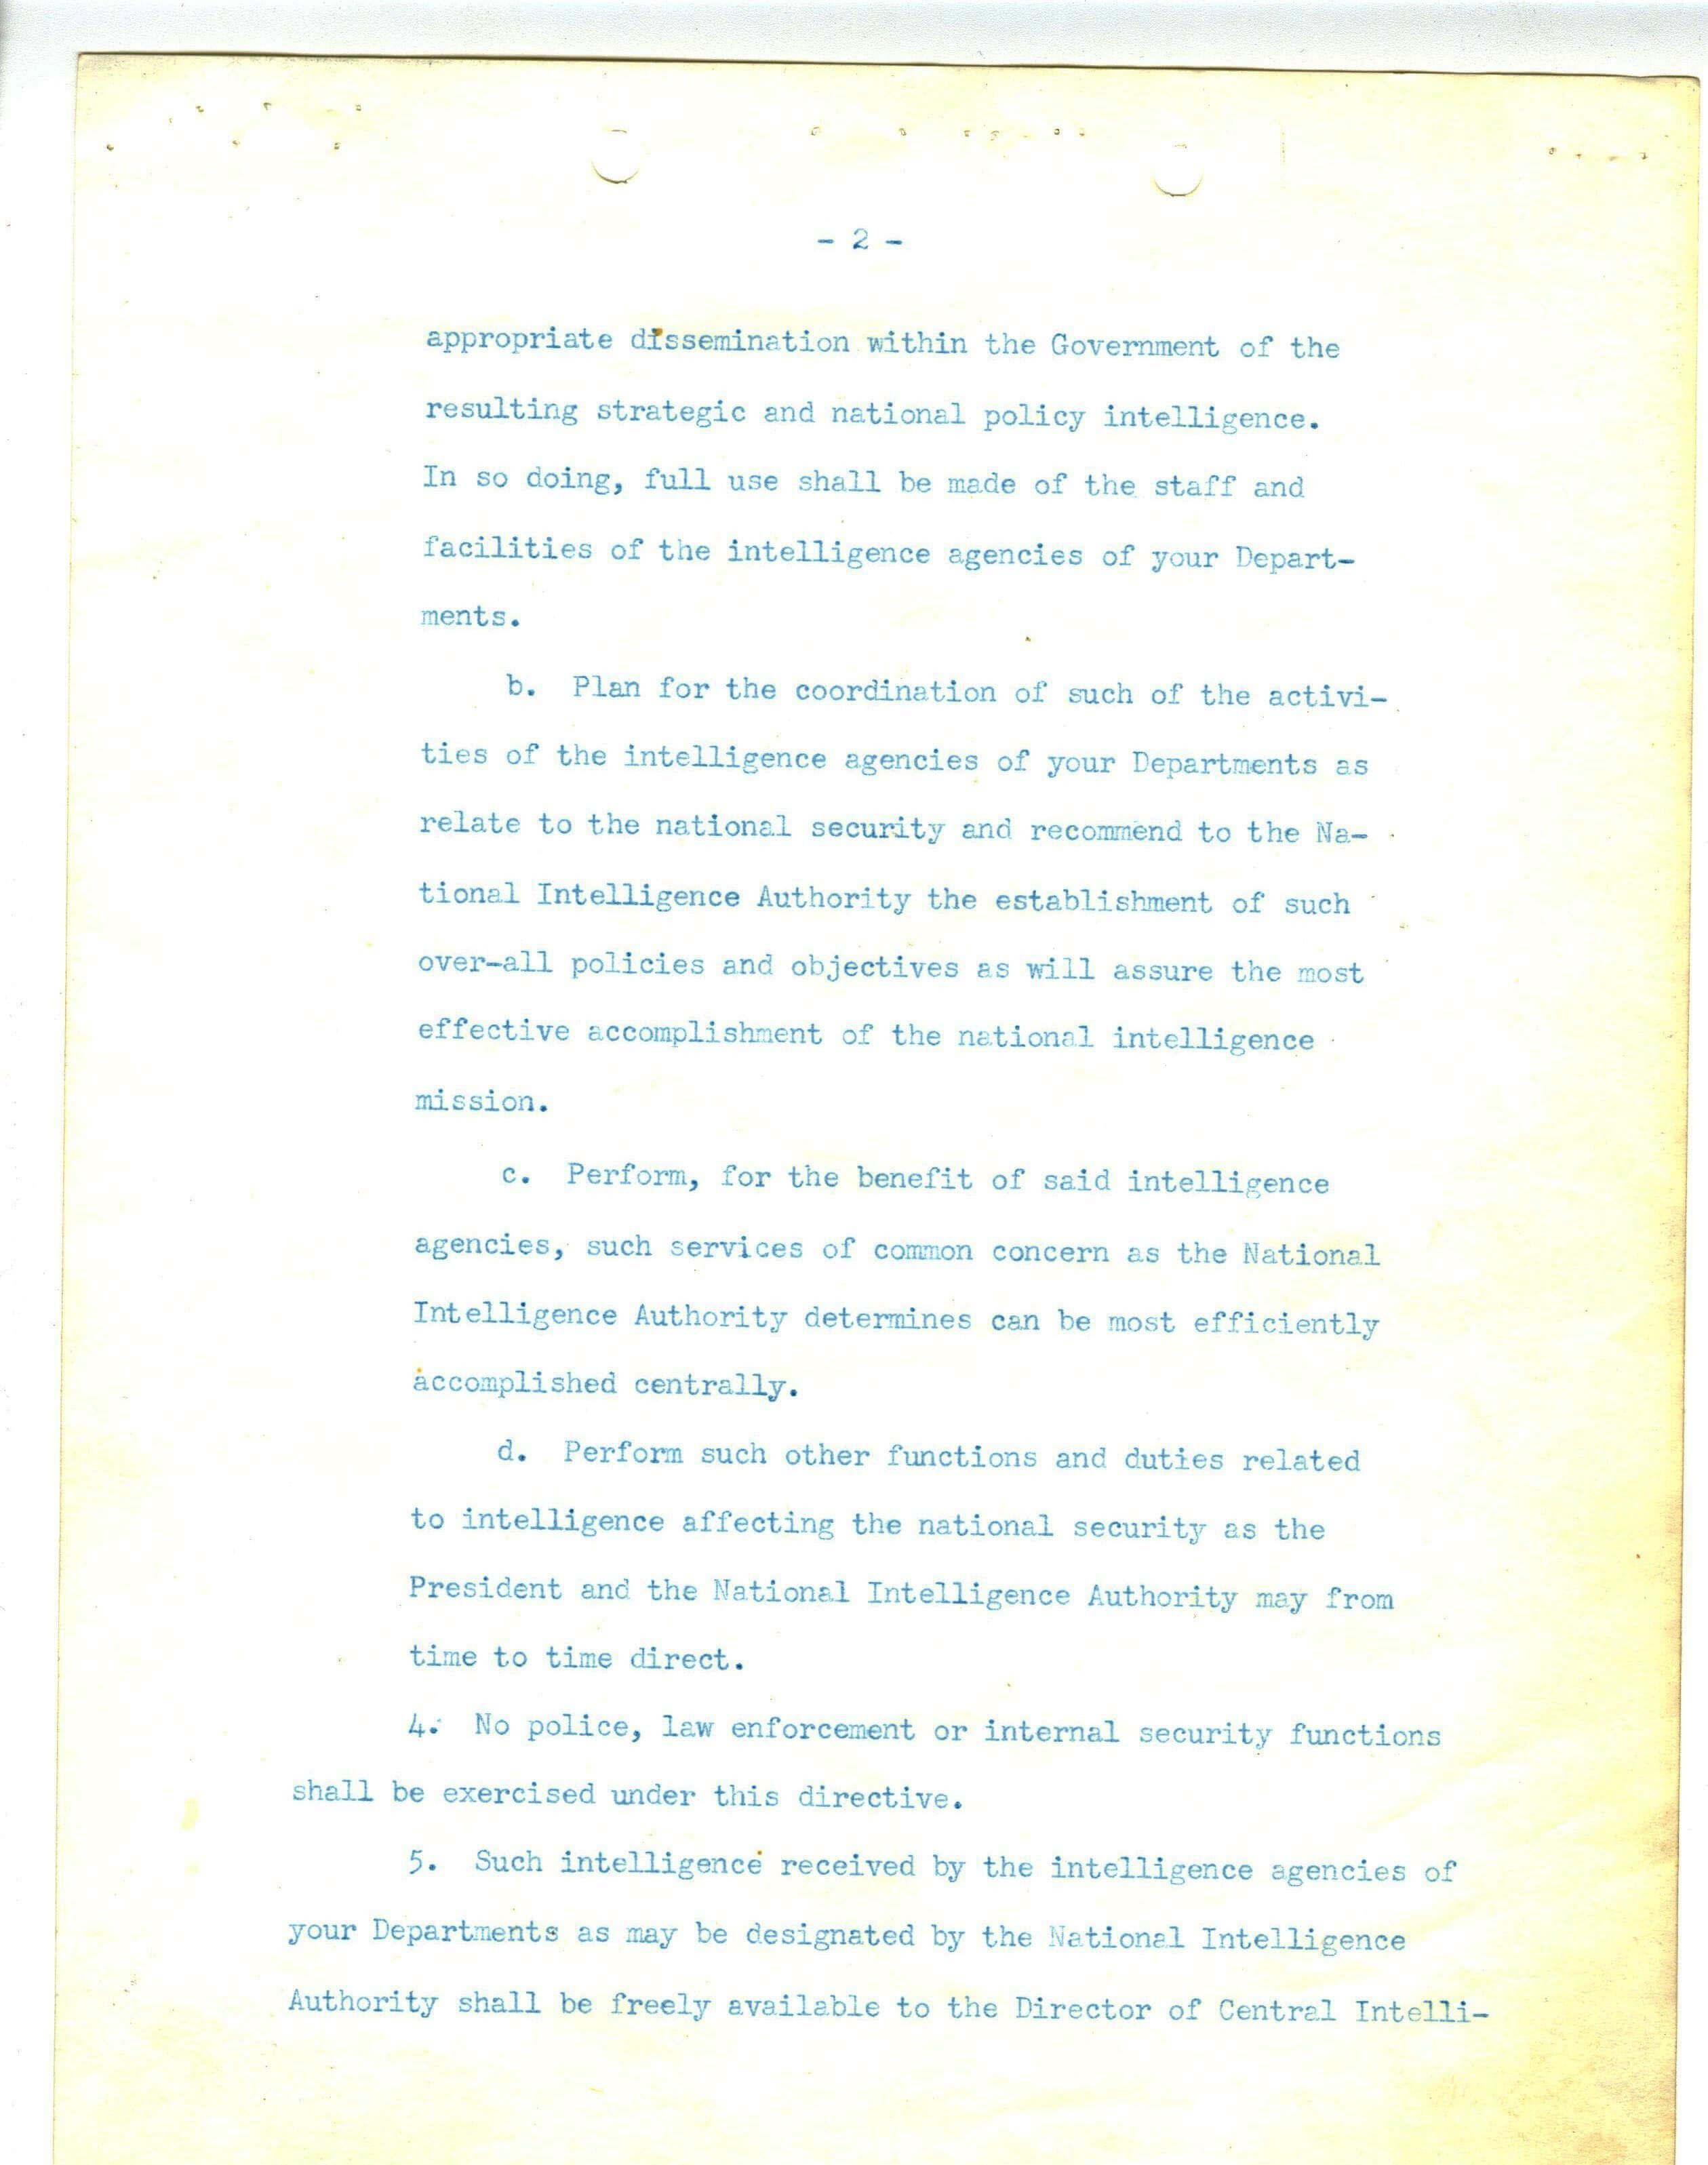 Jan 22 Document 2